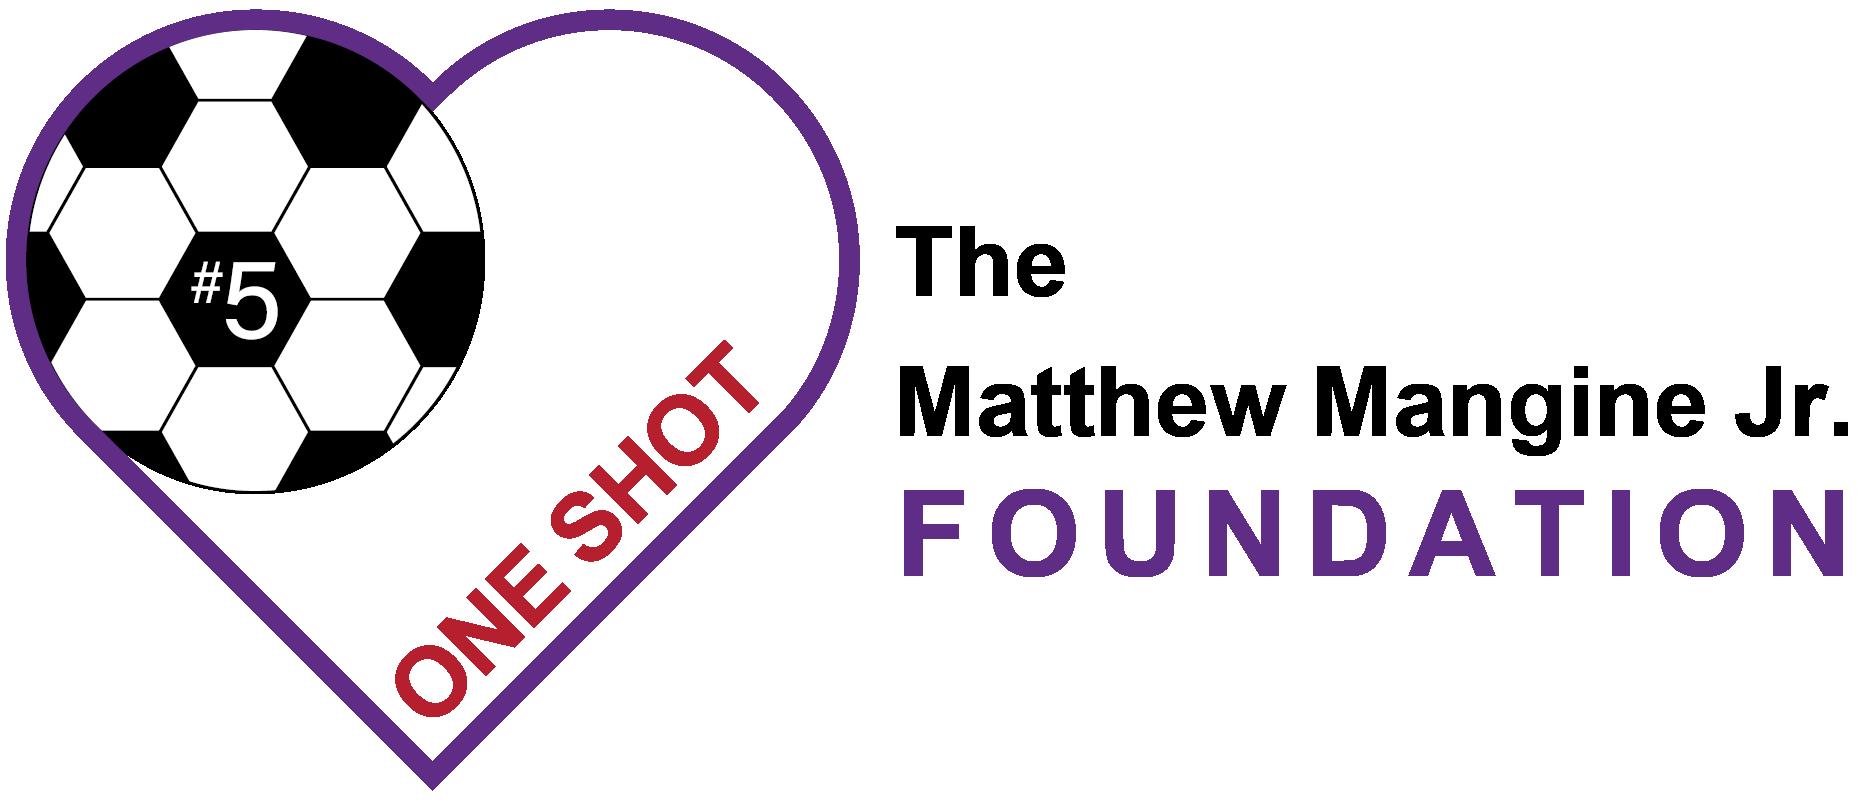 The Matthew Mangine Jr. Foundation -